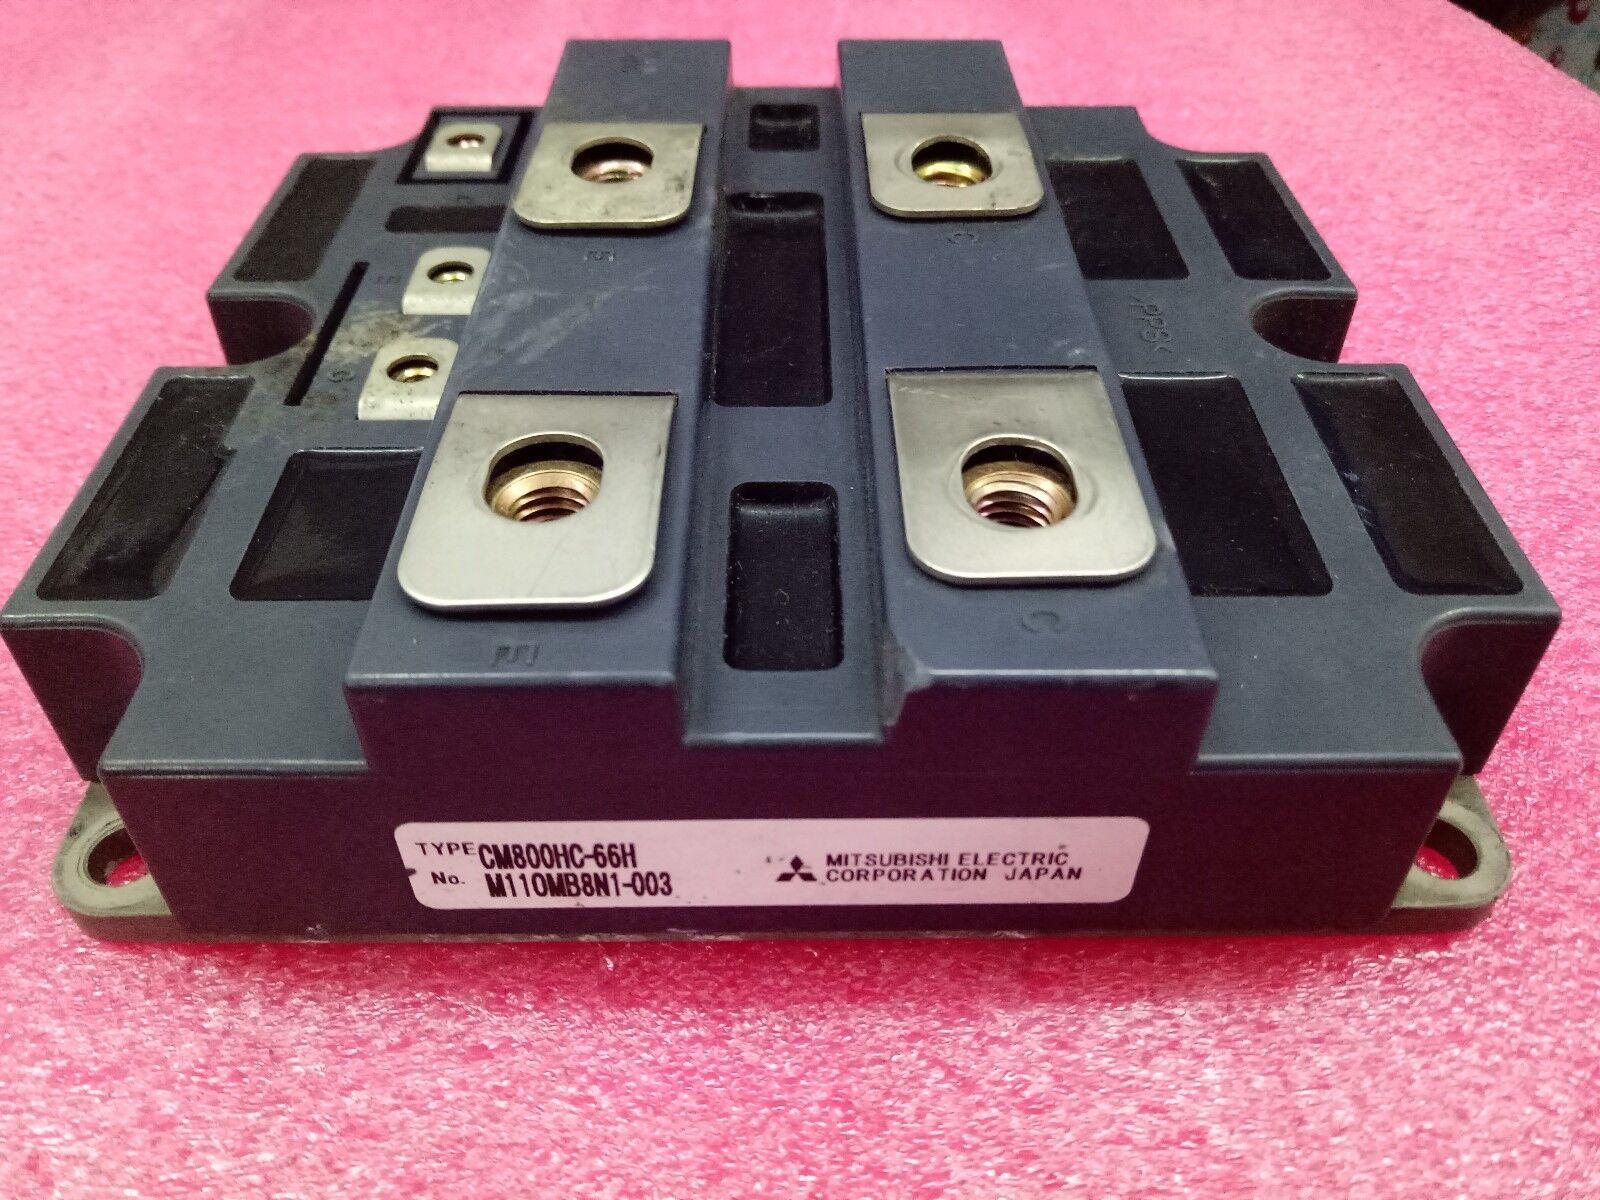 1PC USED CM800HC-66H SHIP EXPRESS  P2040 YL